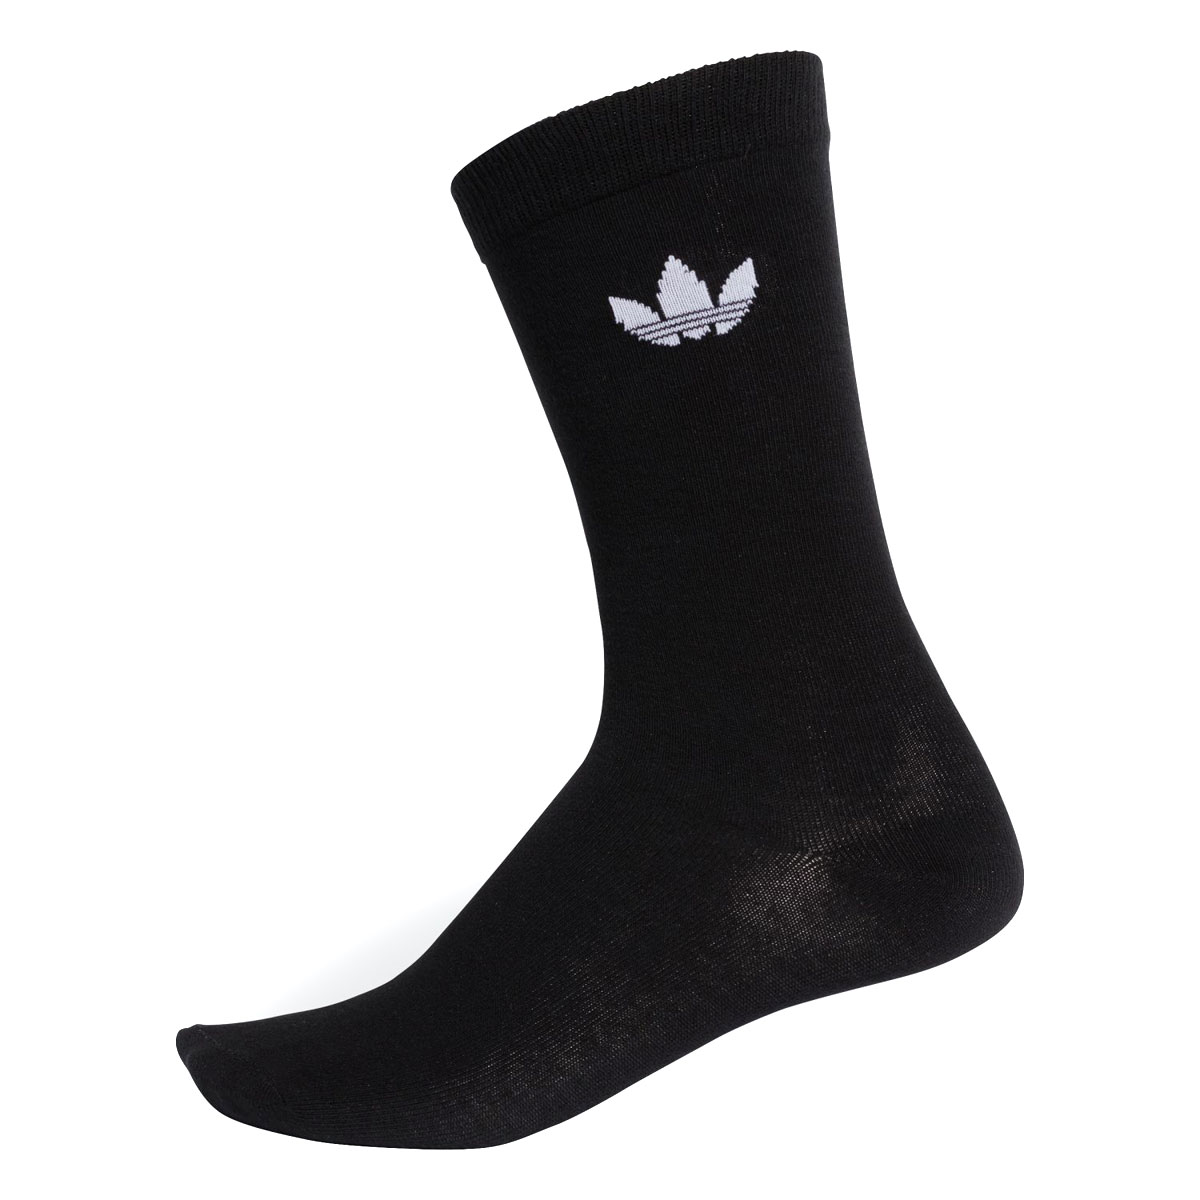 1314281022d702 adidas Originals THIN TREFOIL CREW SOCKS (BLACK WHITE) (Adidas originals  THIN トレフォイルクルーソックス)